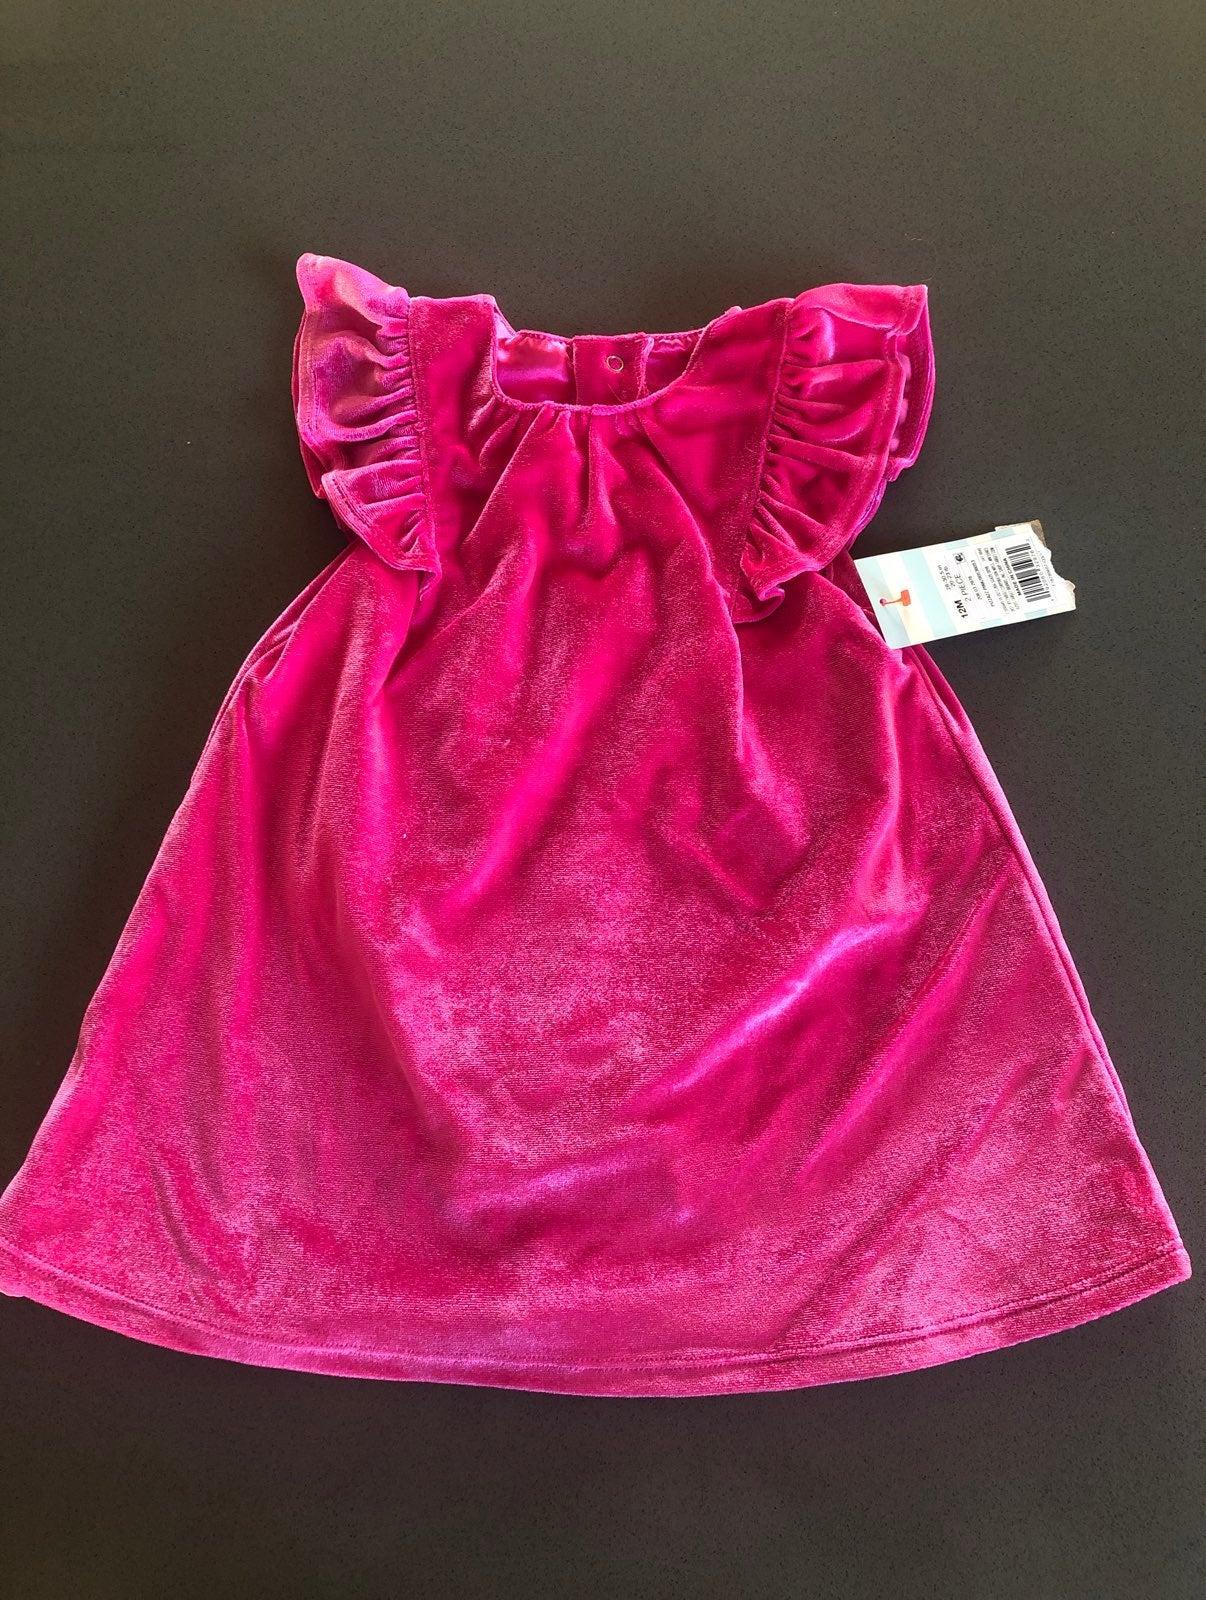 Toddler Dress Size 12 Months